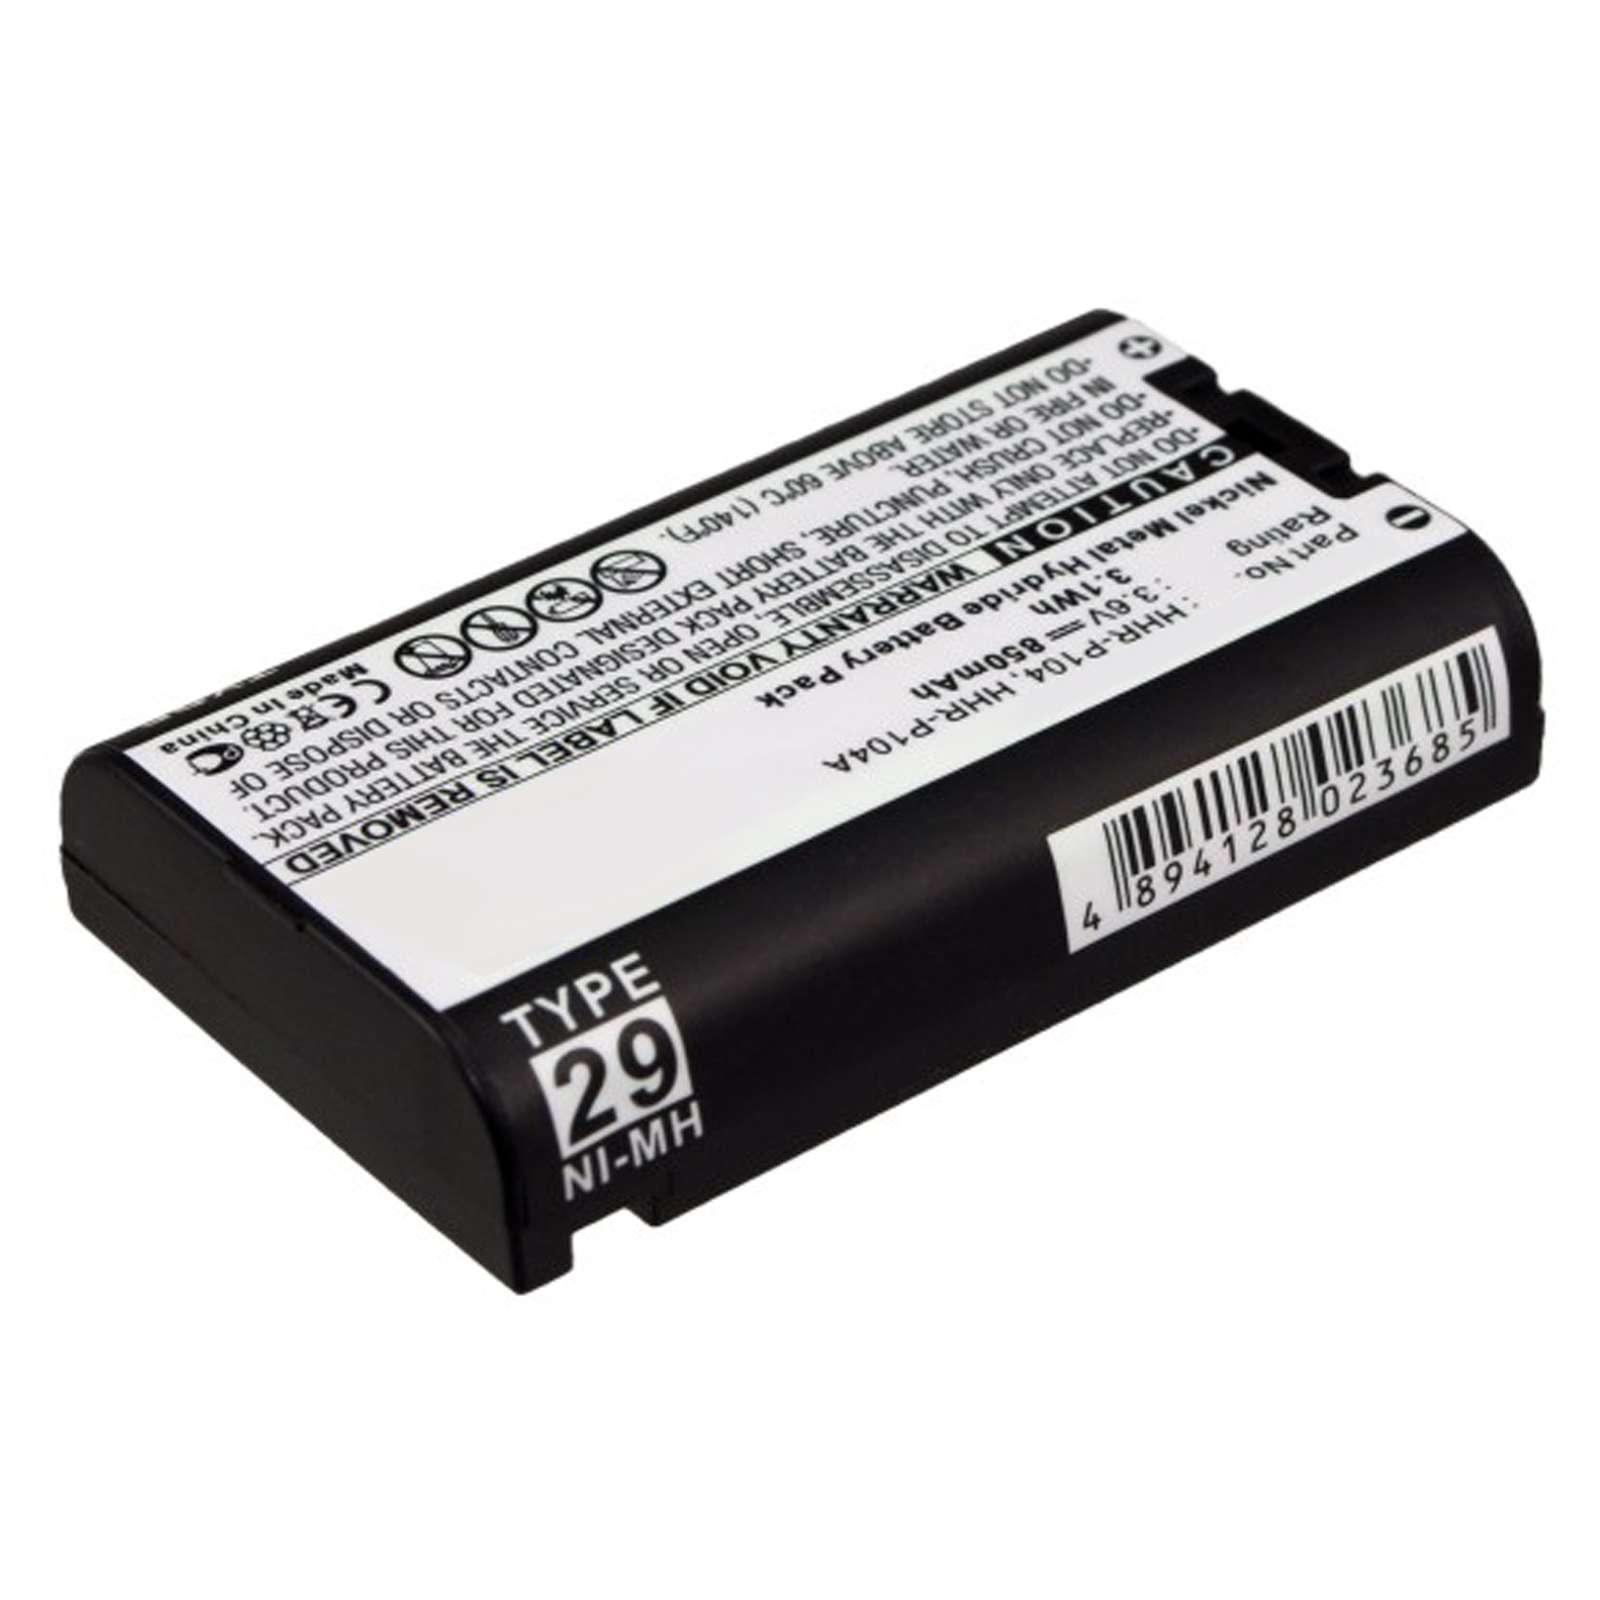 foto de Cordless Phone Battery EBCP 104 For Panasonic HHR P104